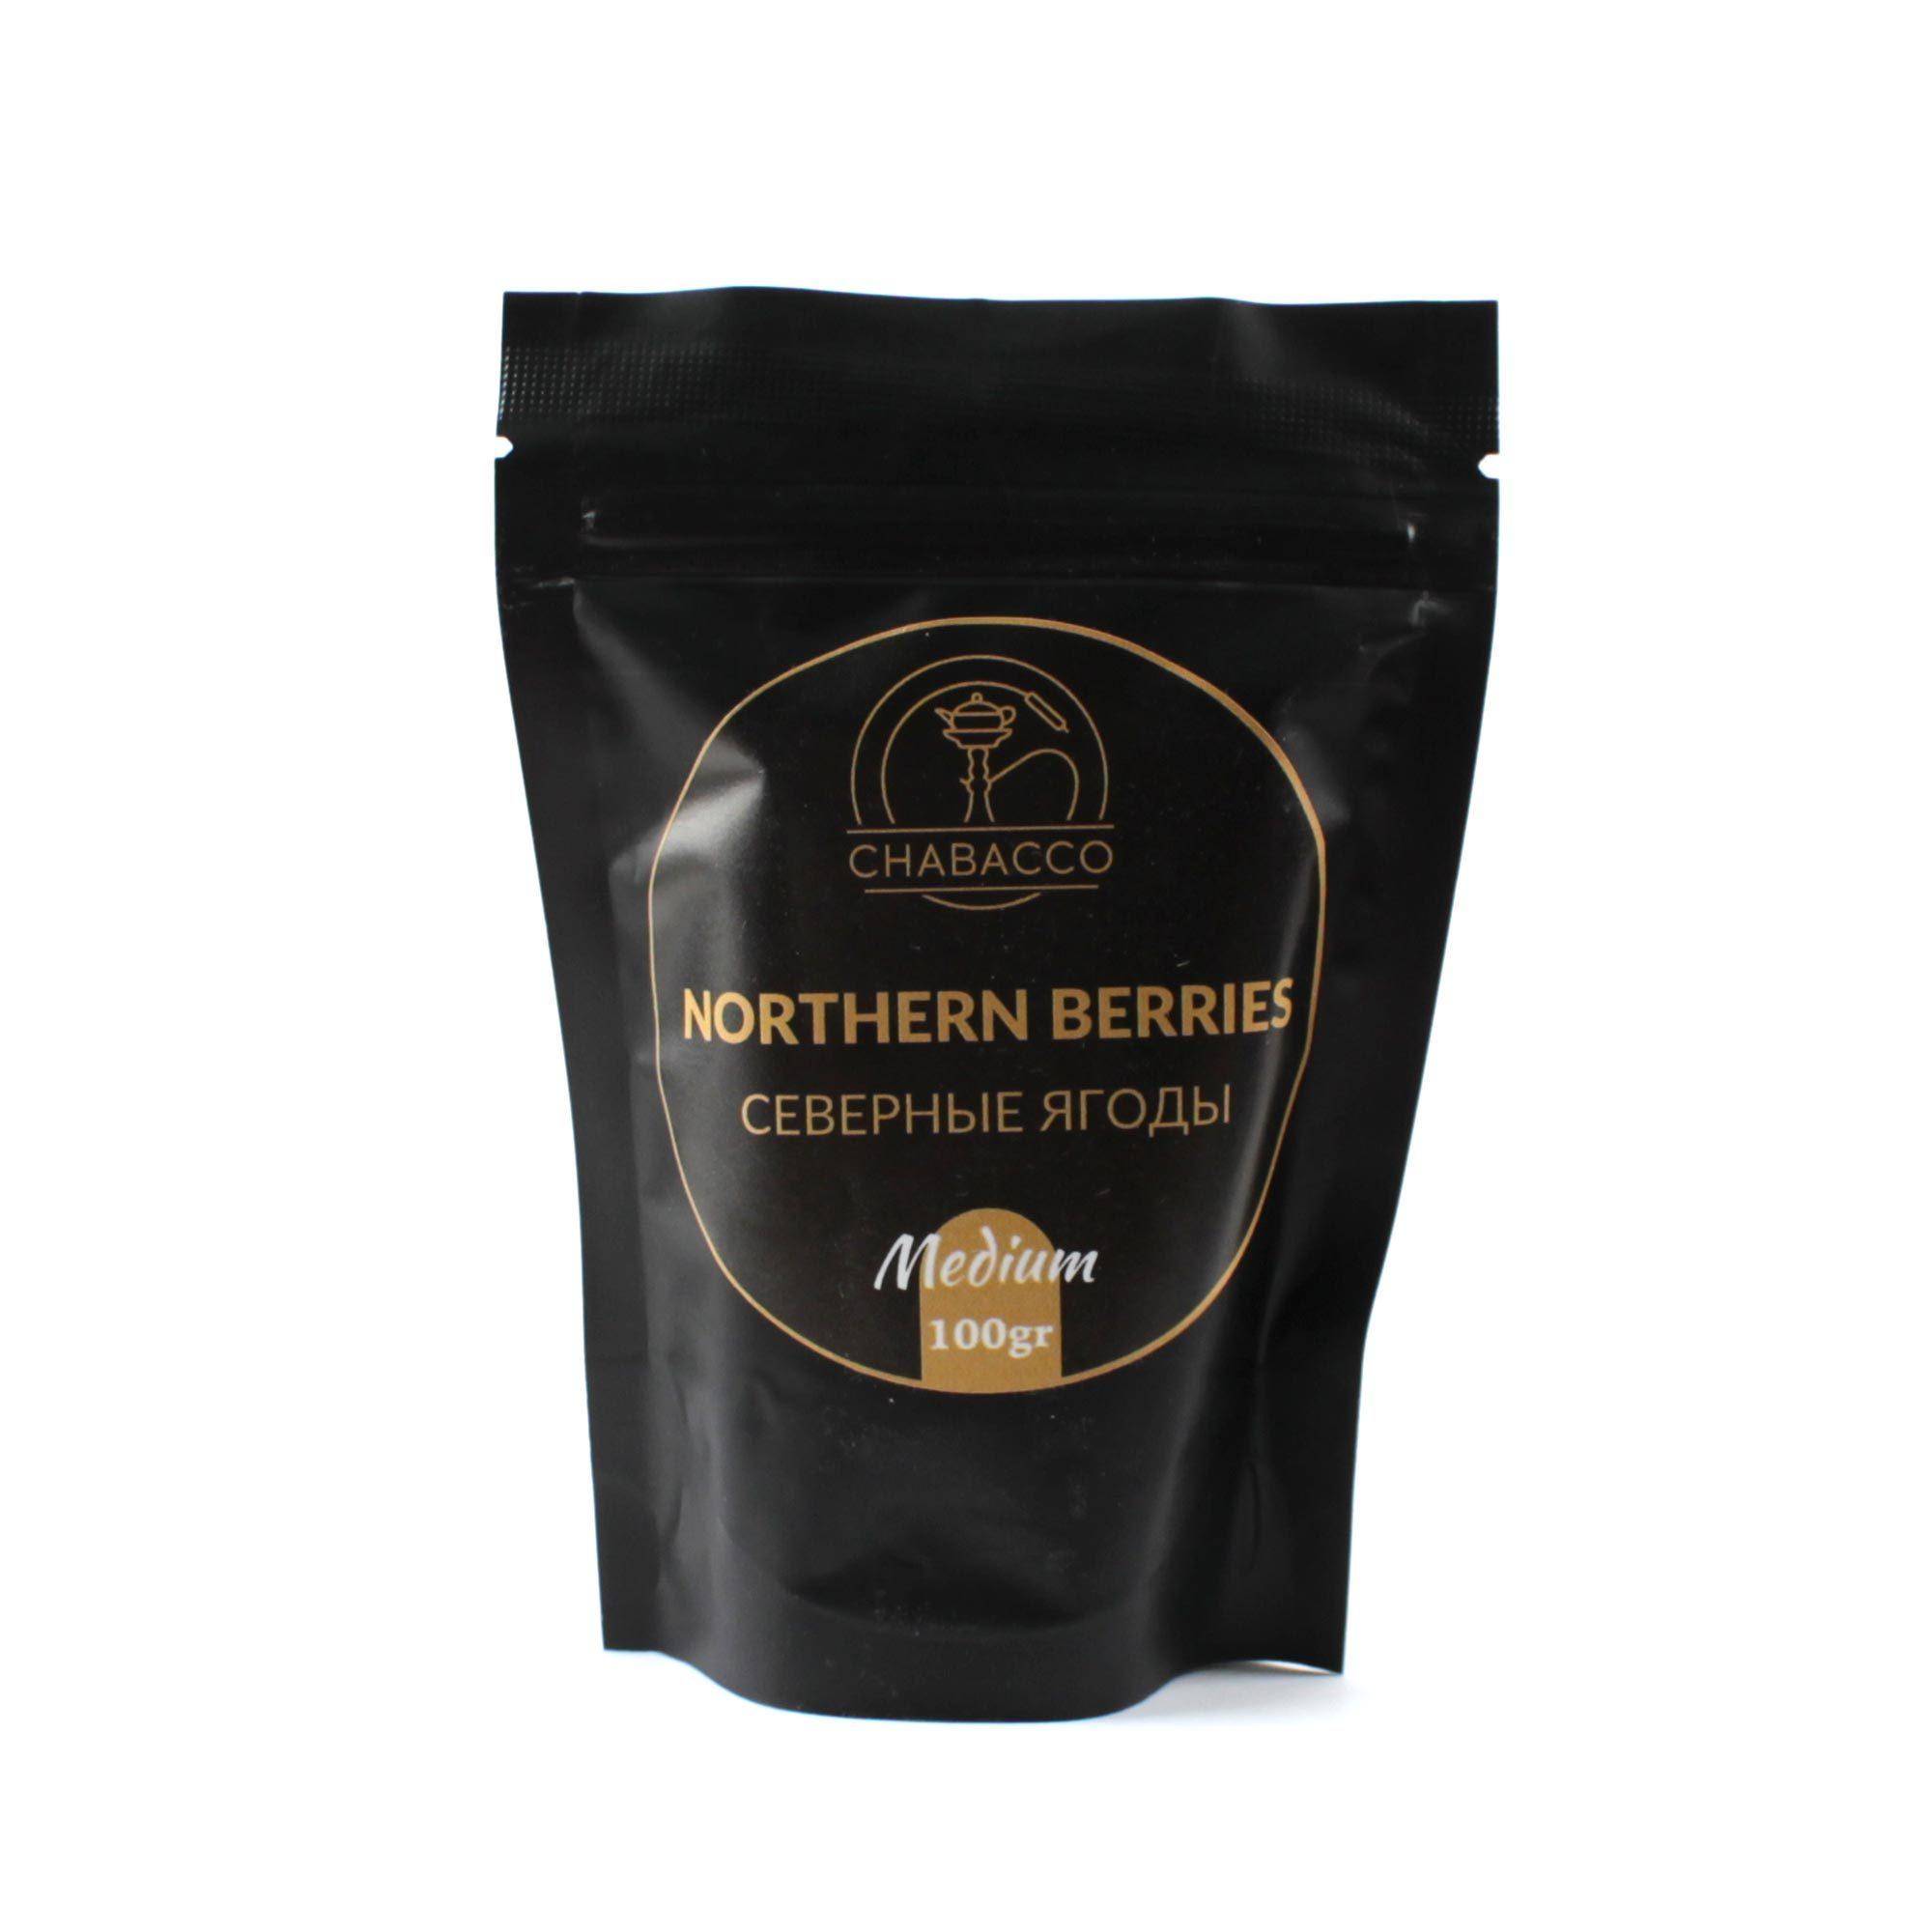 Кальянная смесь Chabacco Medium 100 гр Northern Berries